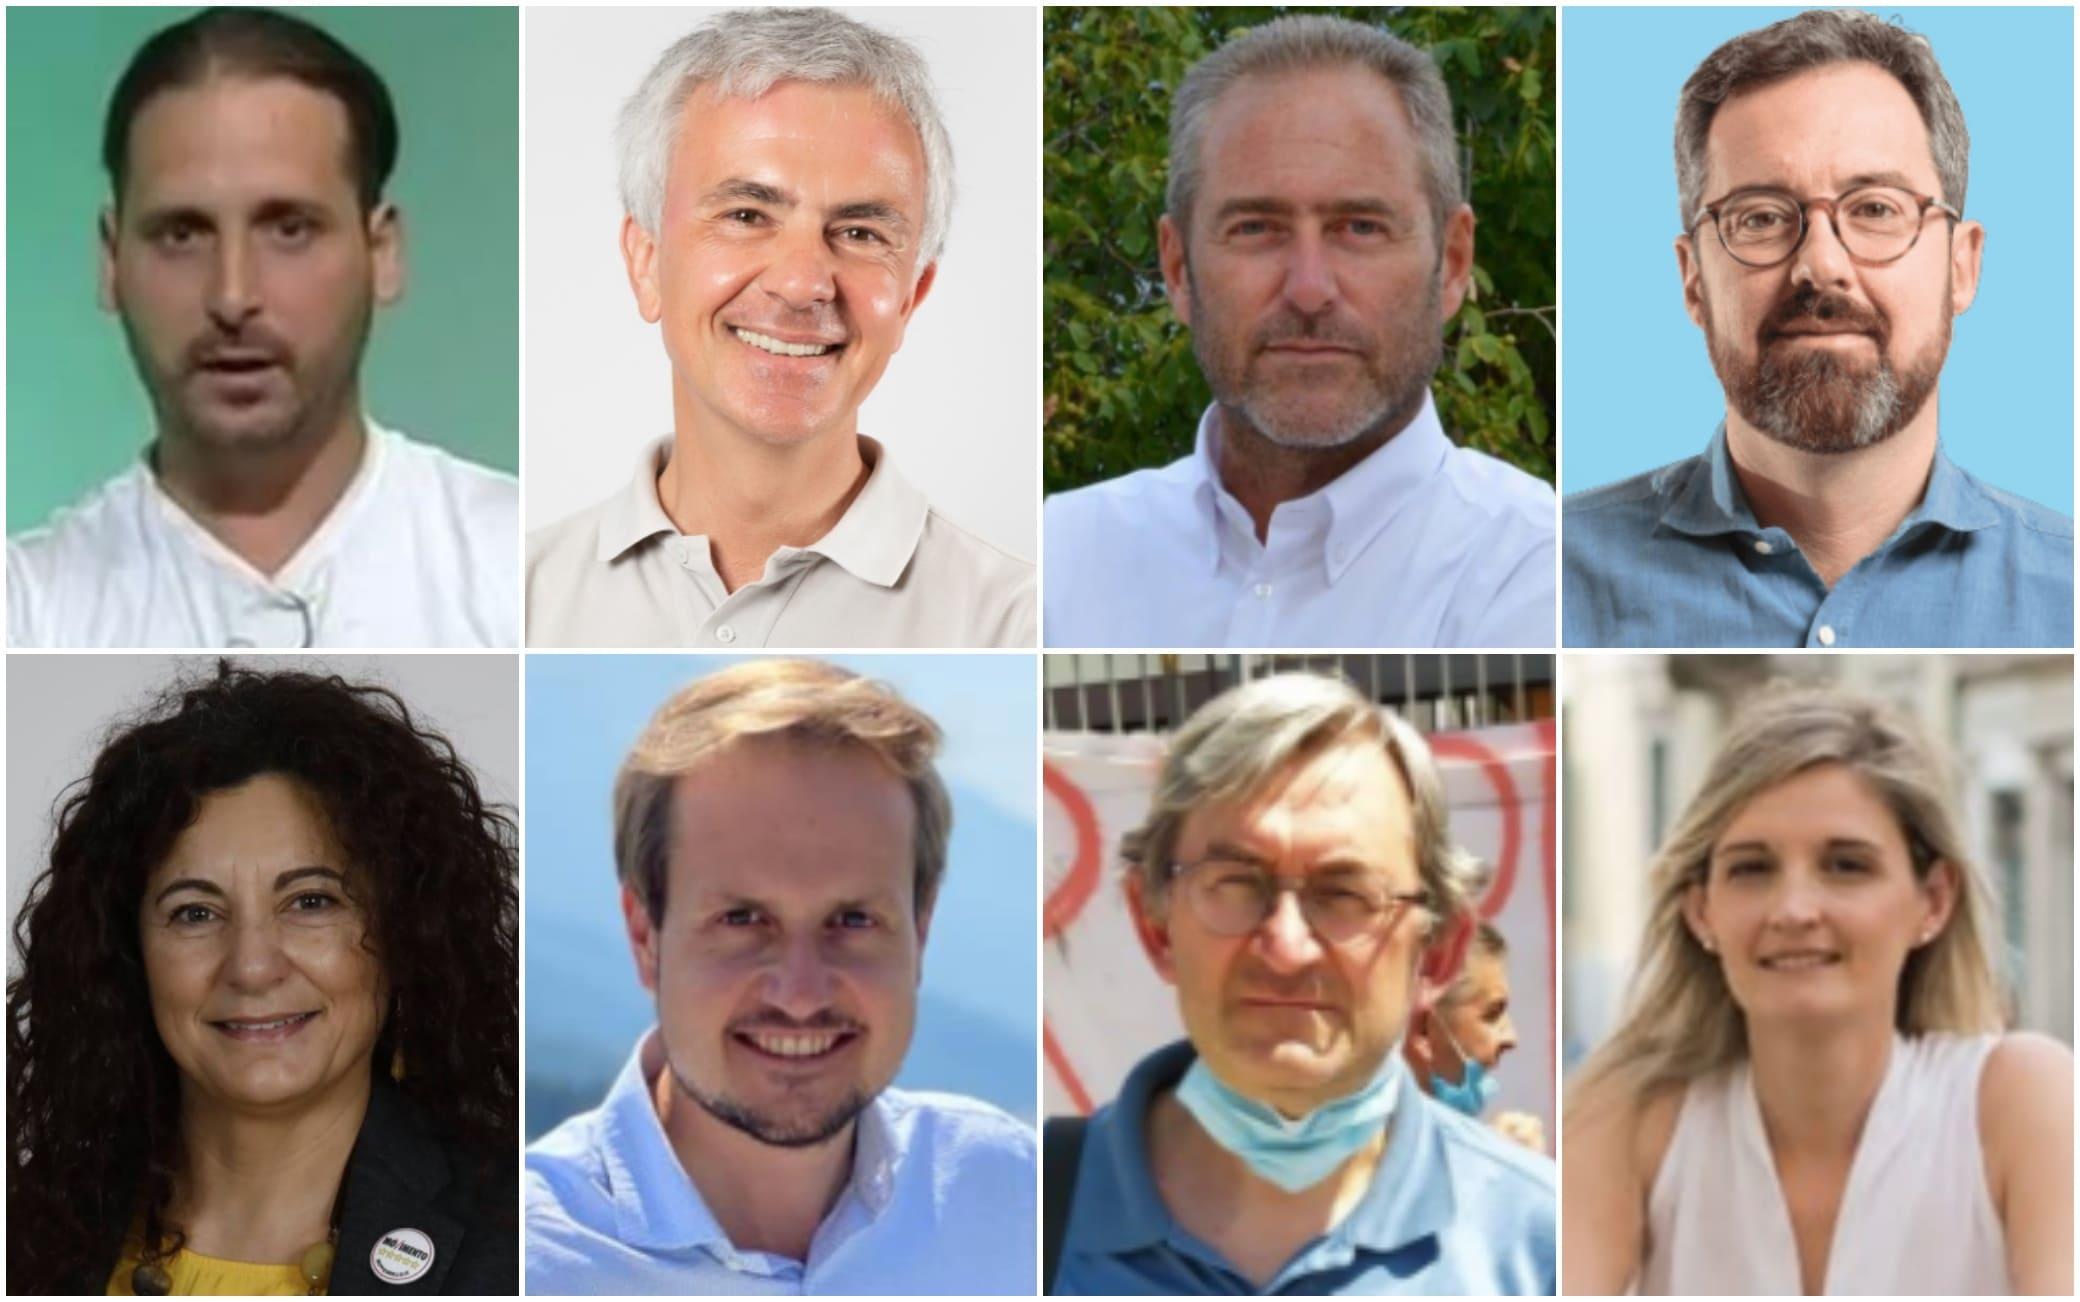 candidati sindaco trento 2020